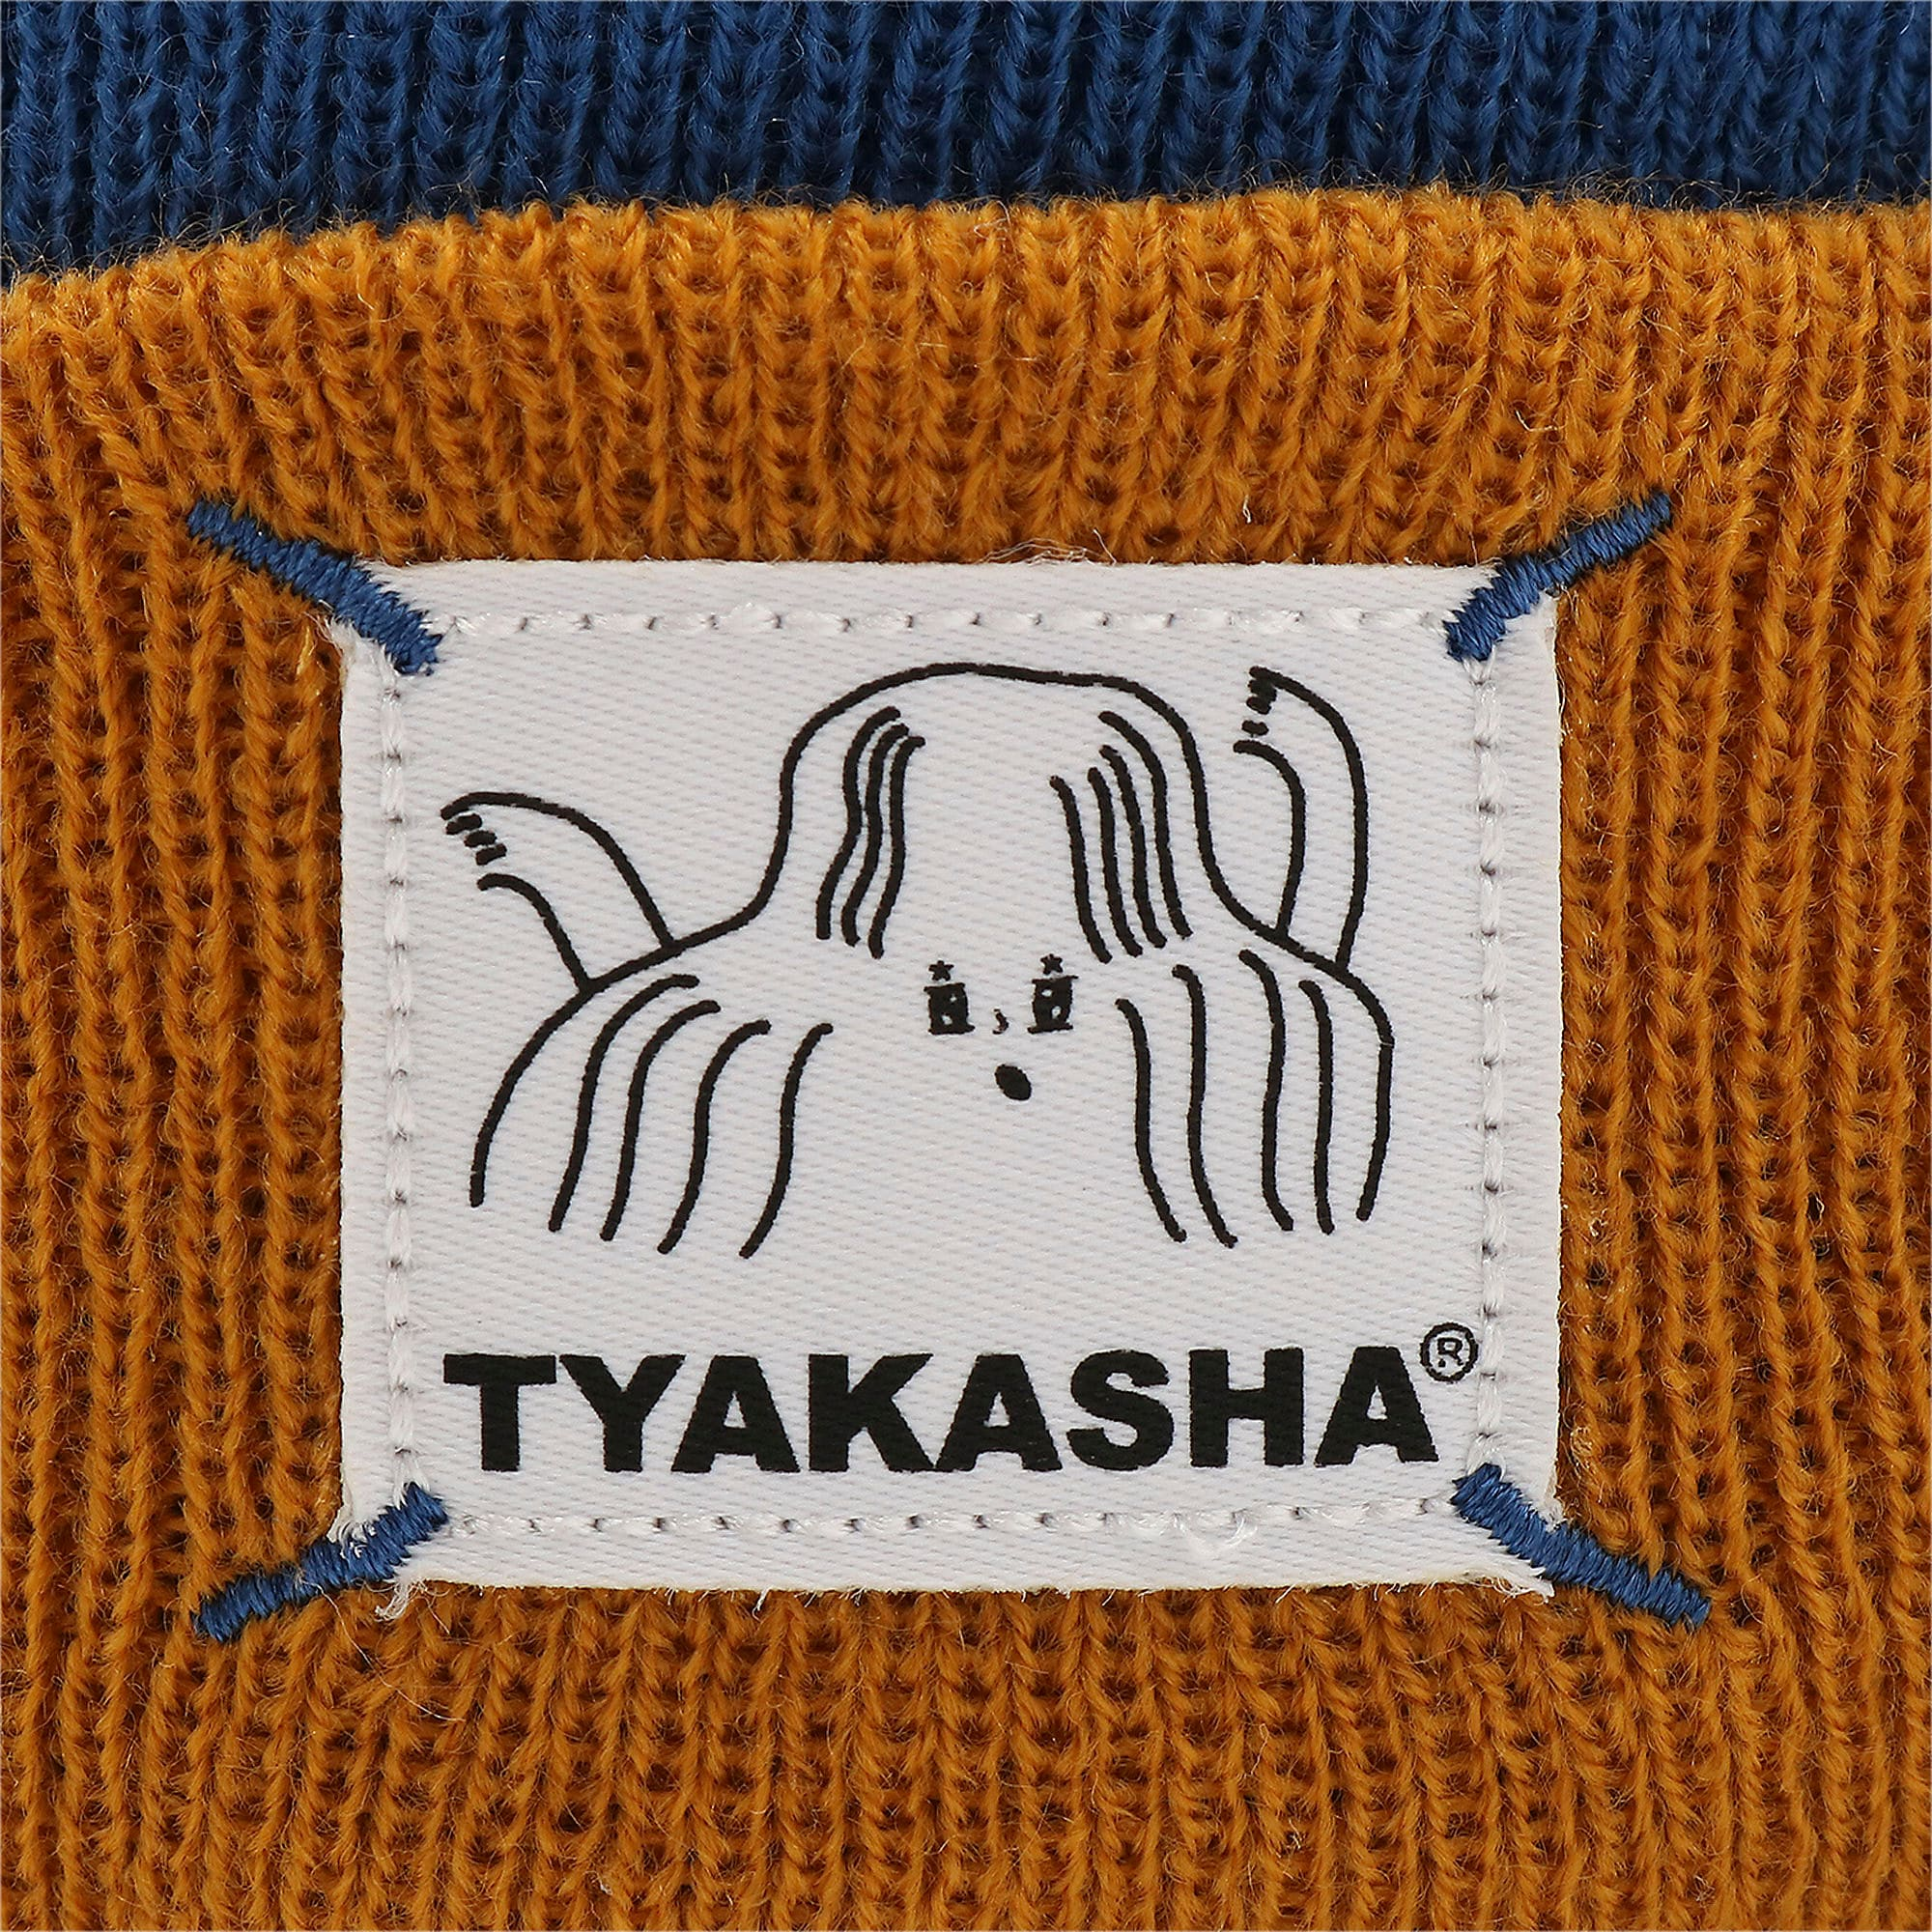 Thumbnail 6 of PUMA x TYAKASHA ビーニー, Galaxy Blue-Buckthorn Brown, medium-JPN